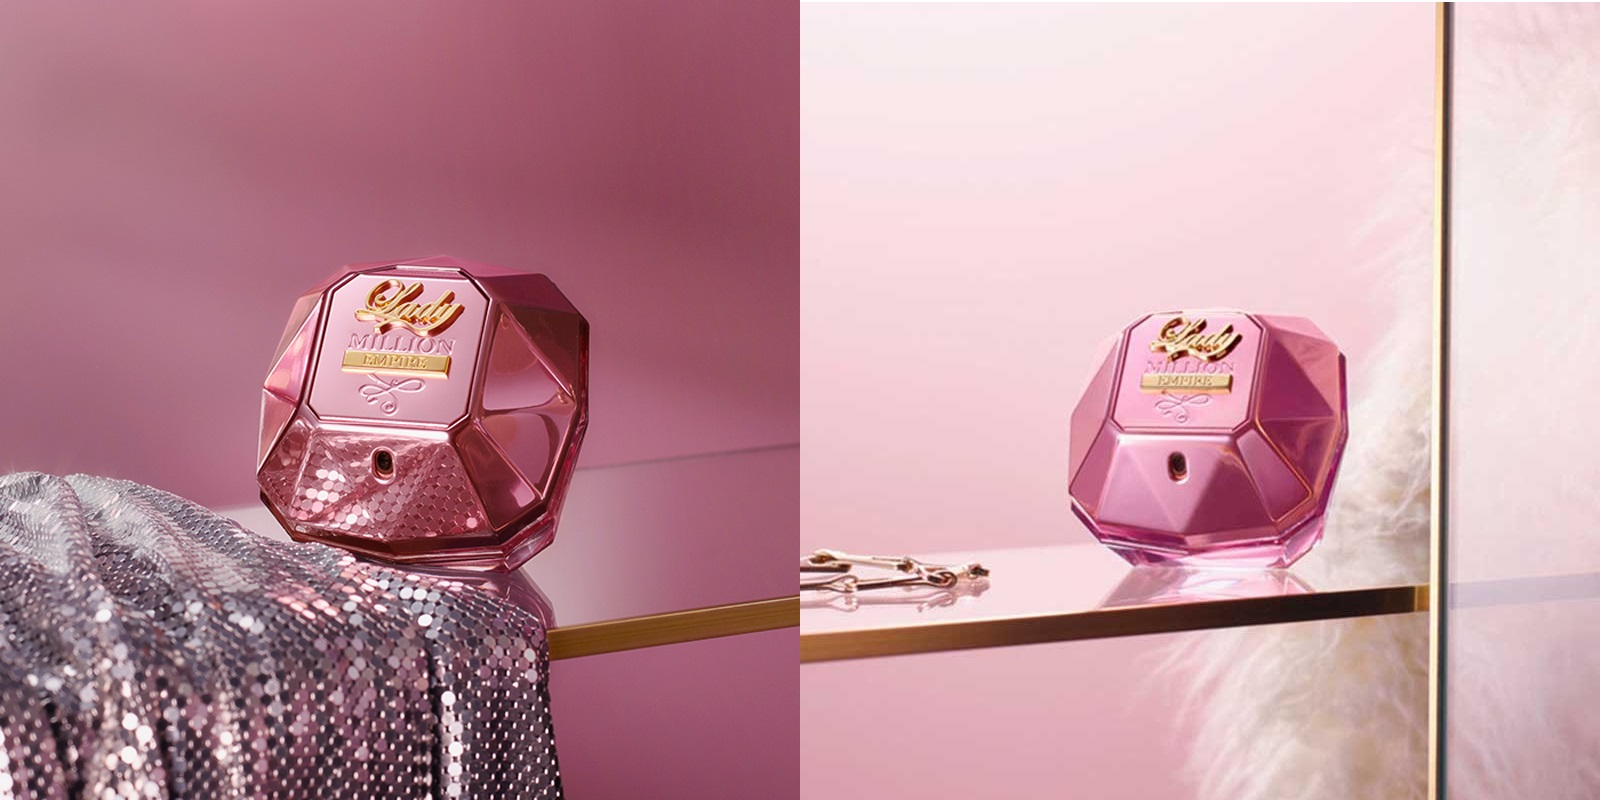 Opinie o perfumach Paco Rabanne Lady Million Empire